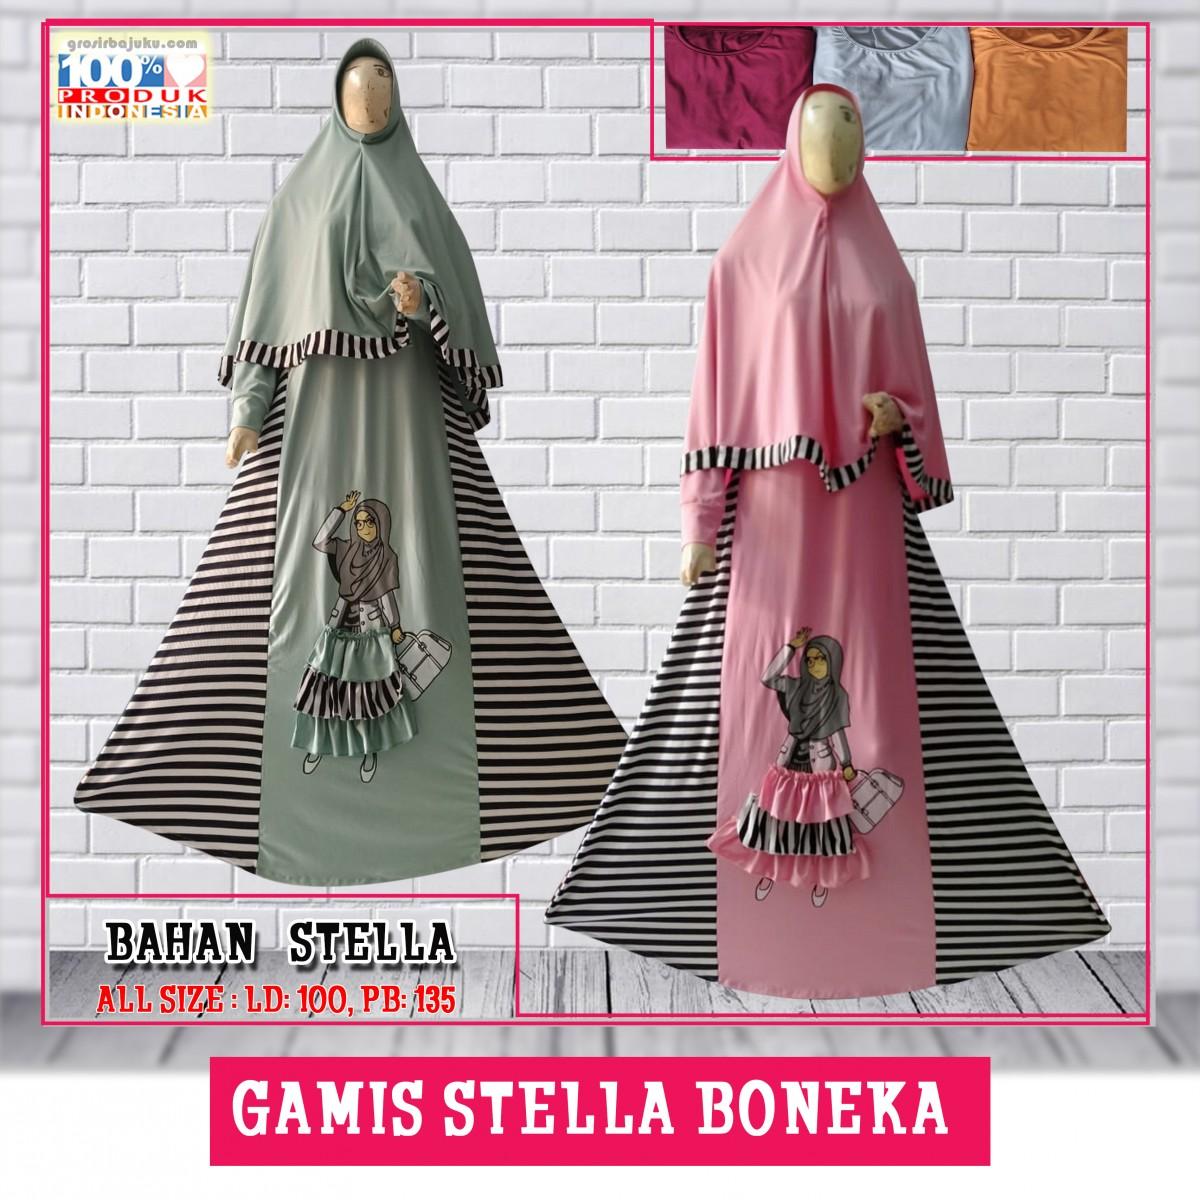 ObralanBaju.com Gamis Stella Boneka